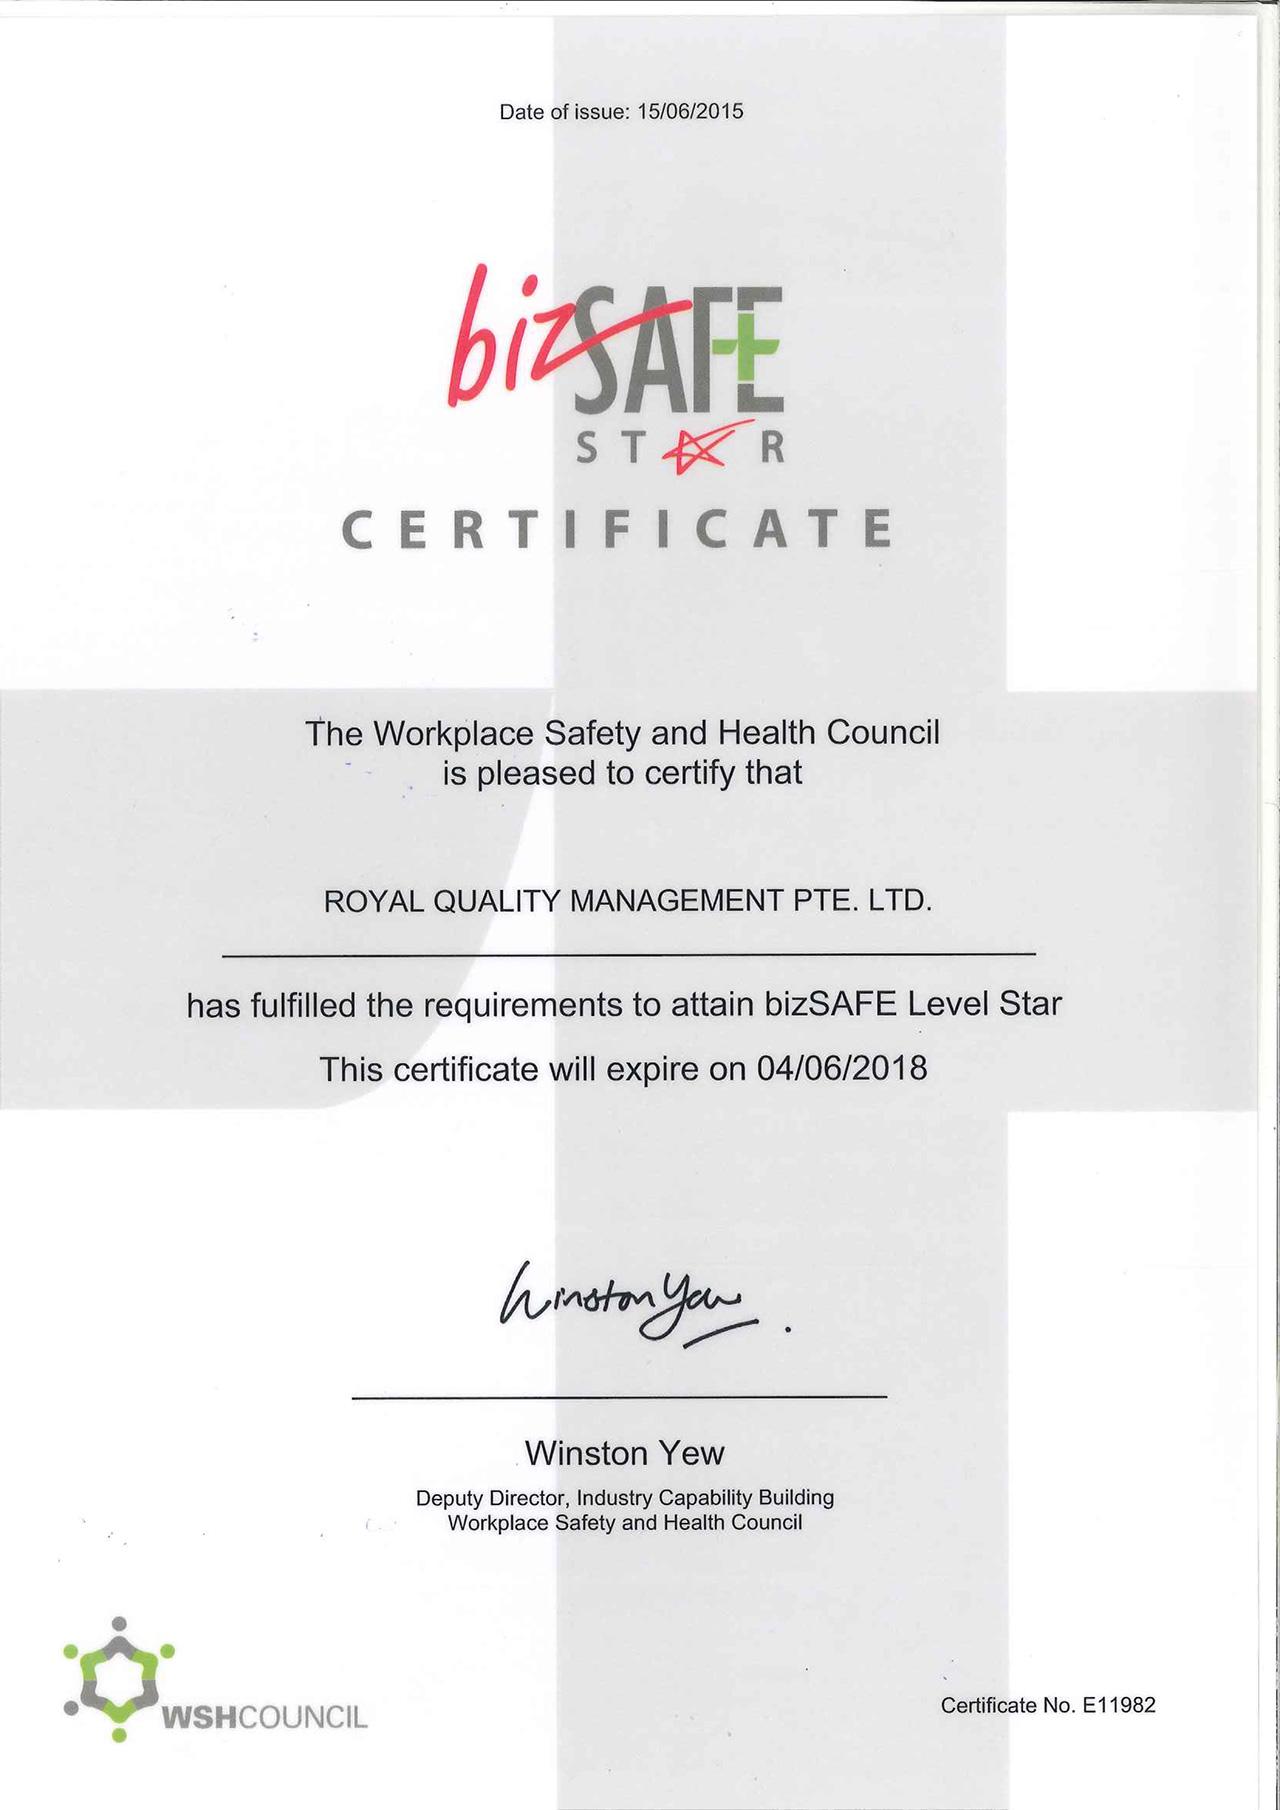 Certificates 2007 2008 Bizsafe